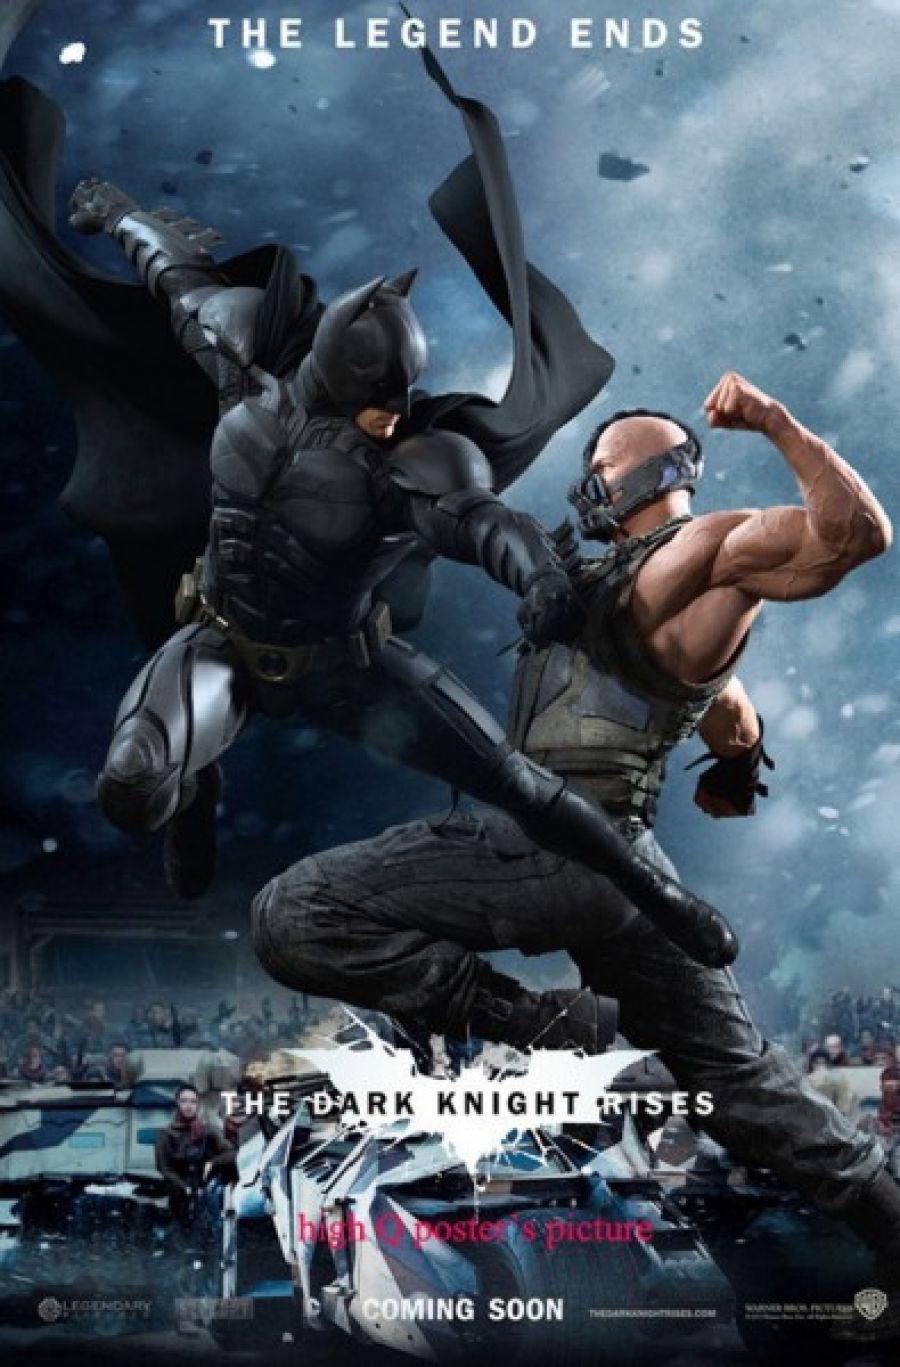 Batman El Caballero De La Noche Asciende The Dark Knight Rises